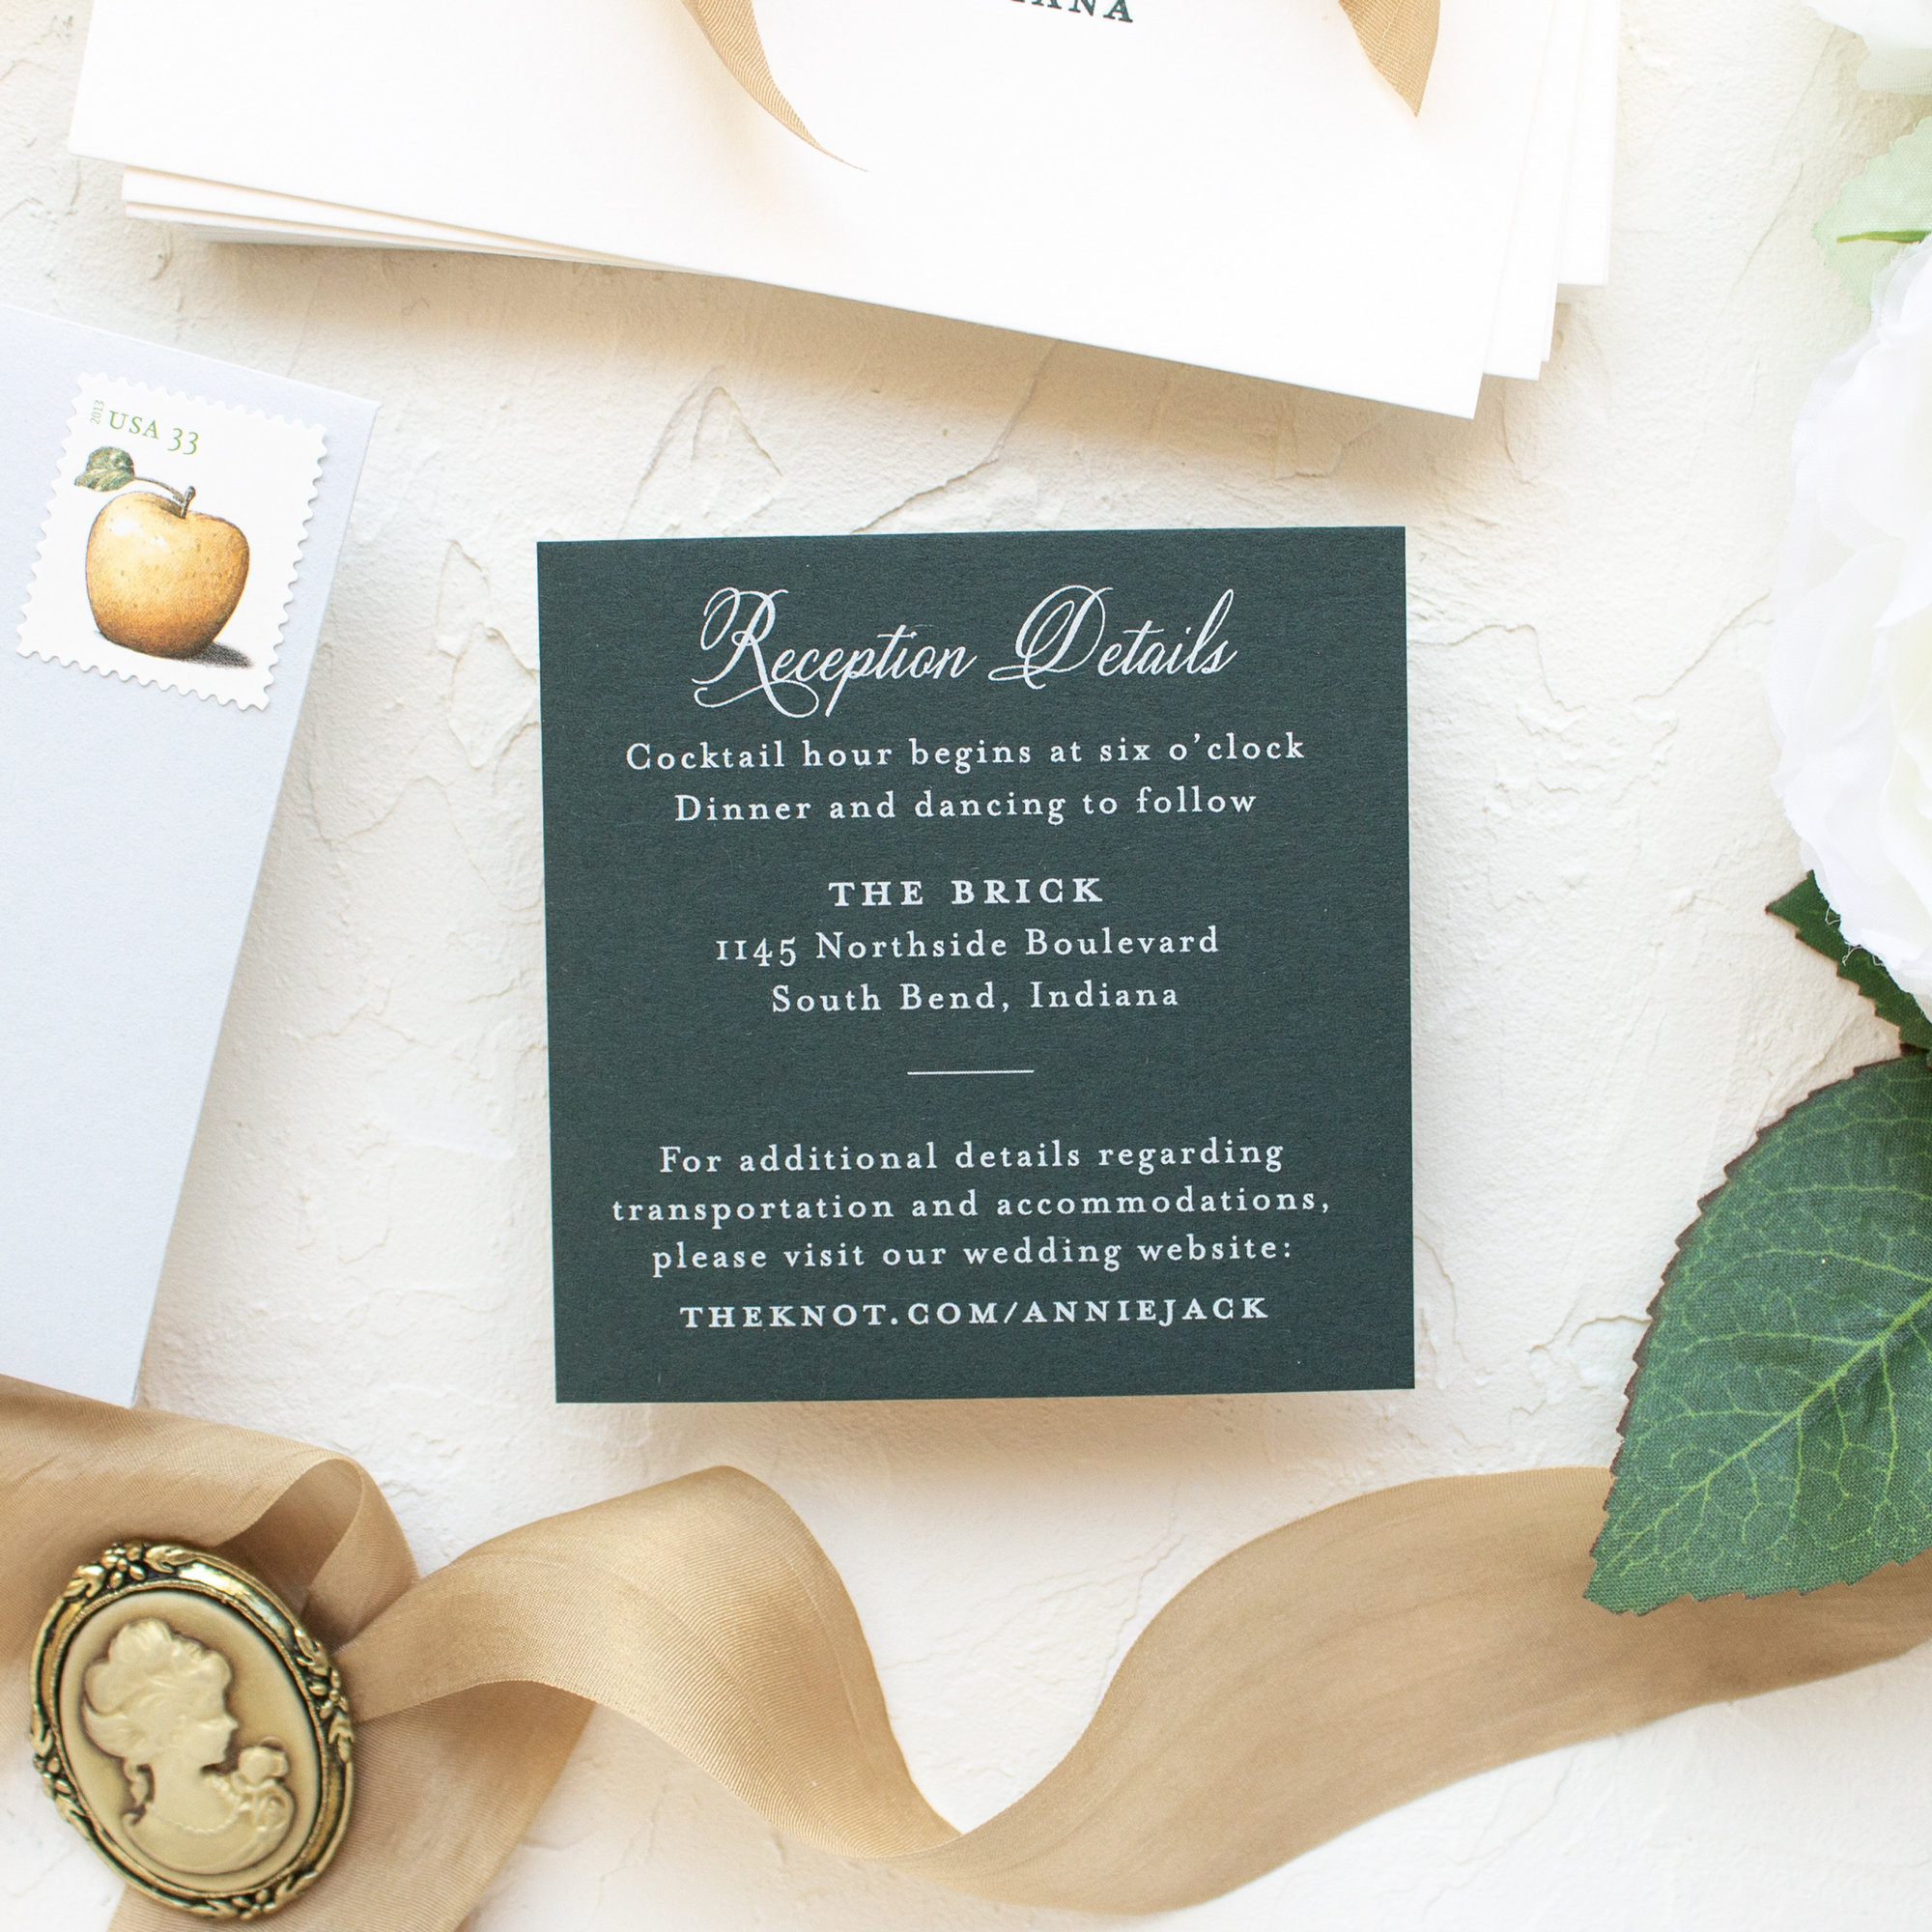 the brick wedding reception card